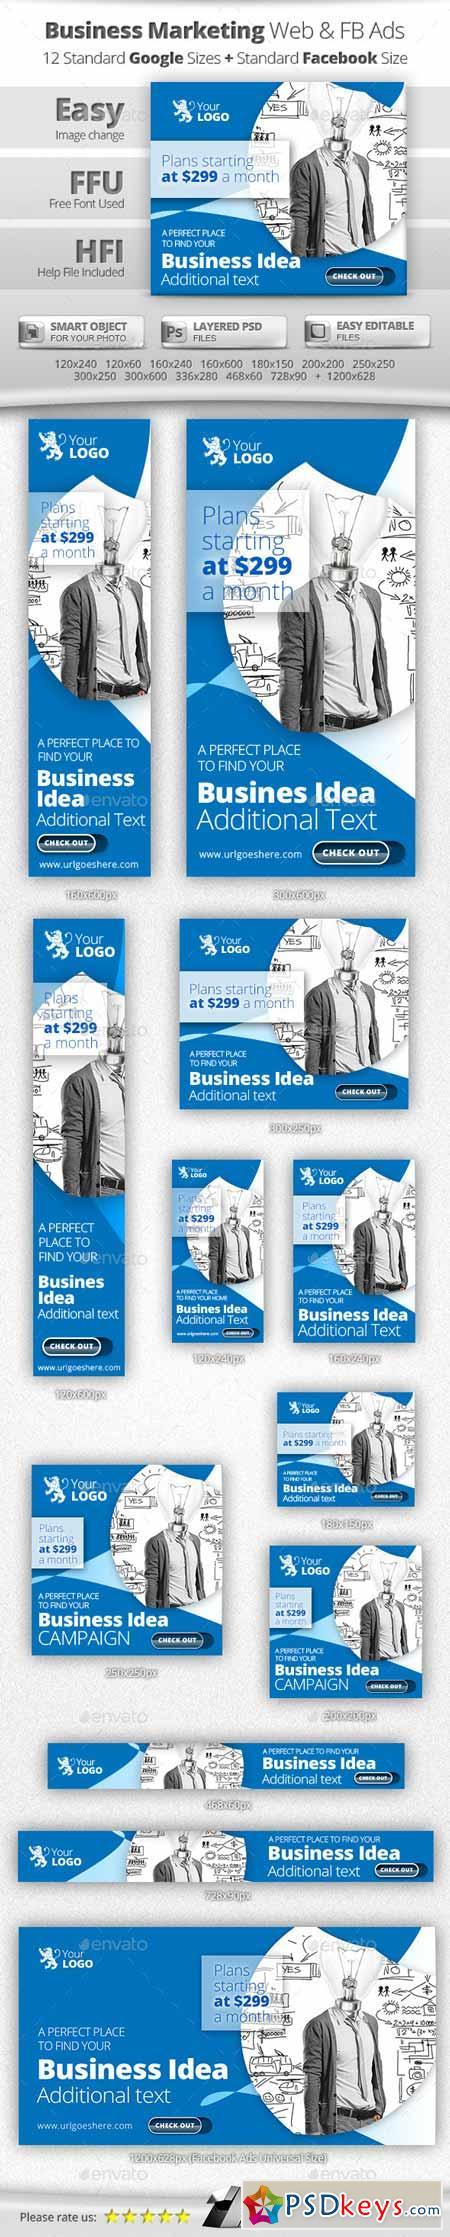 Business Online Marketing Web & Facebook Banners 11459249